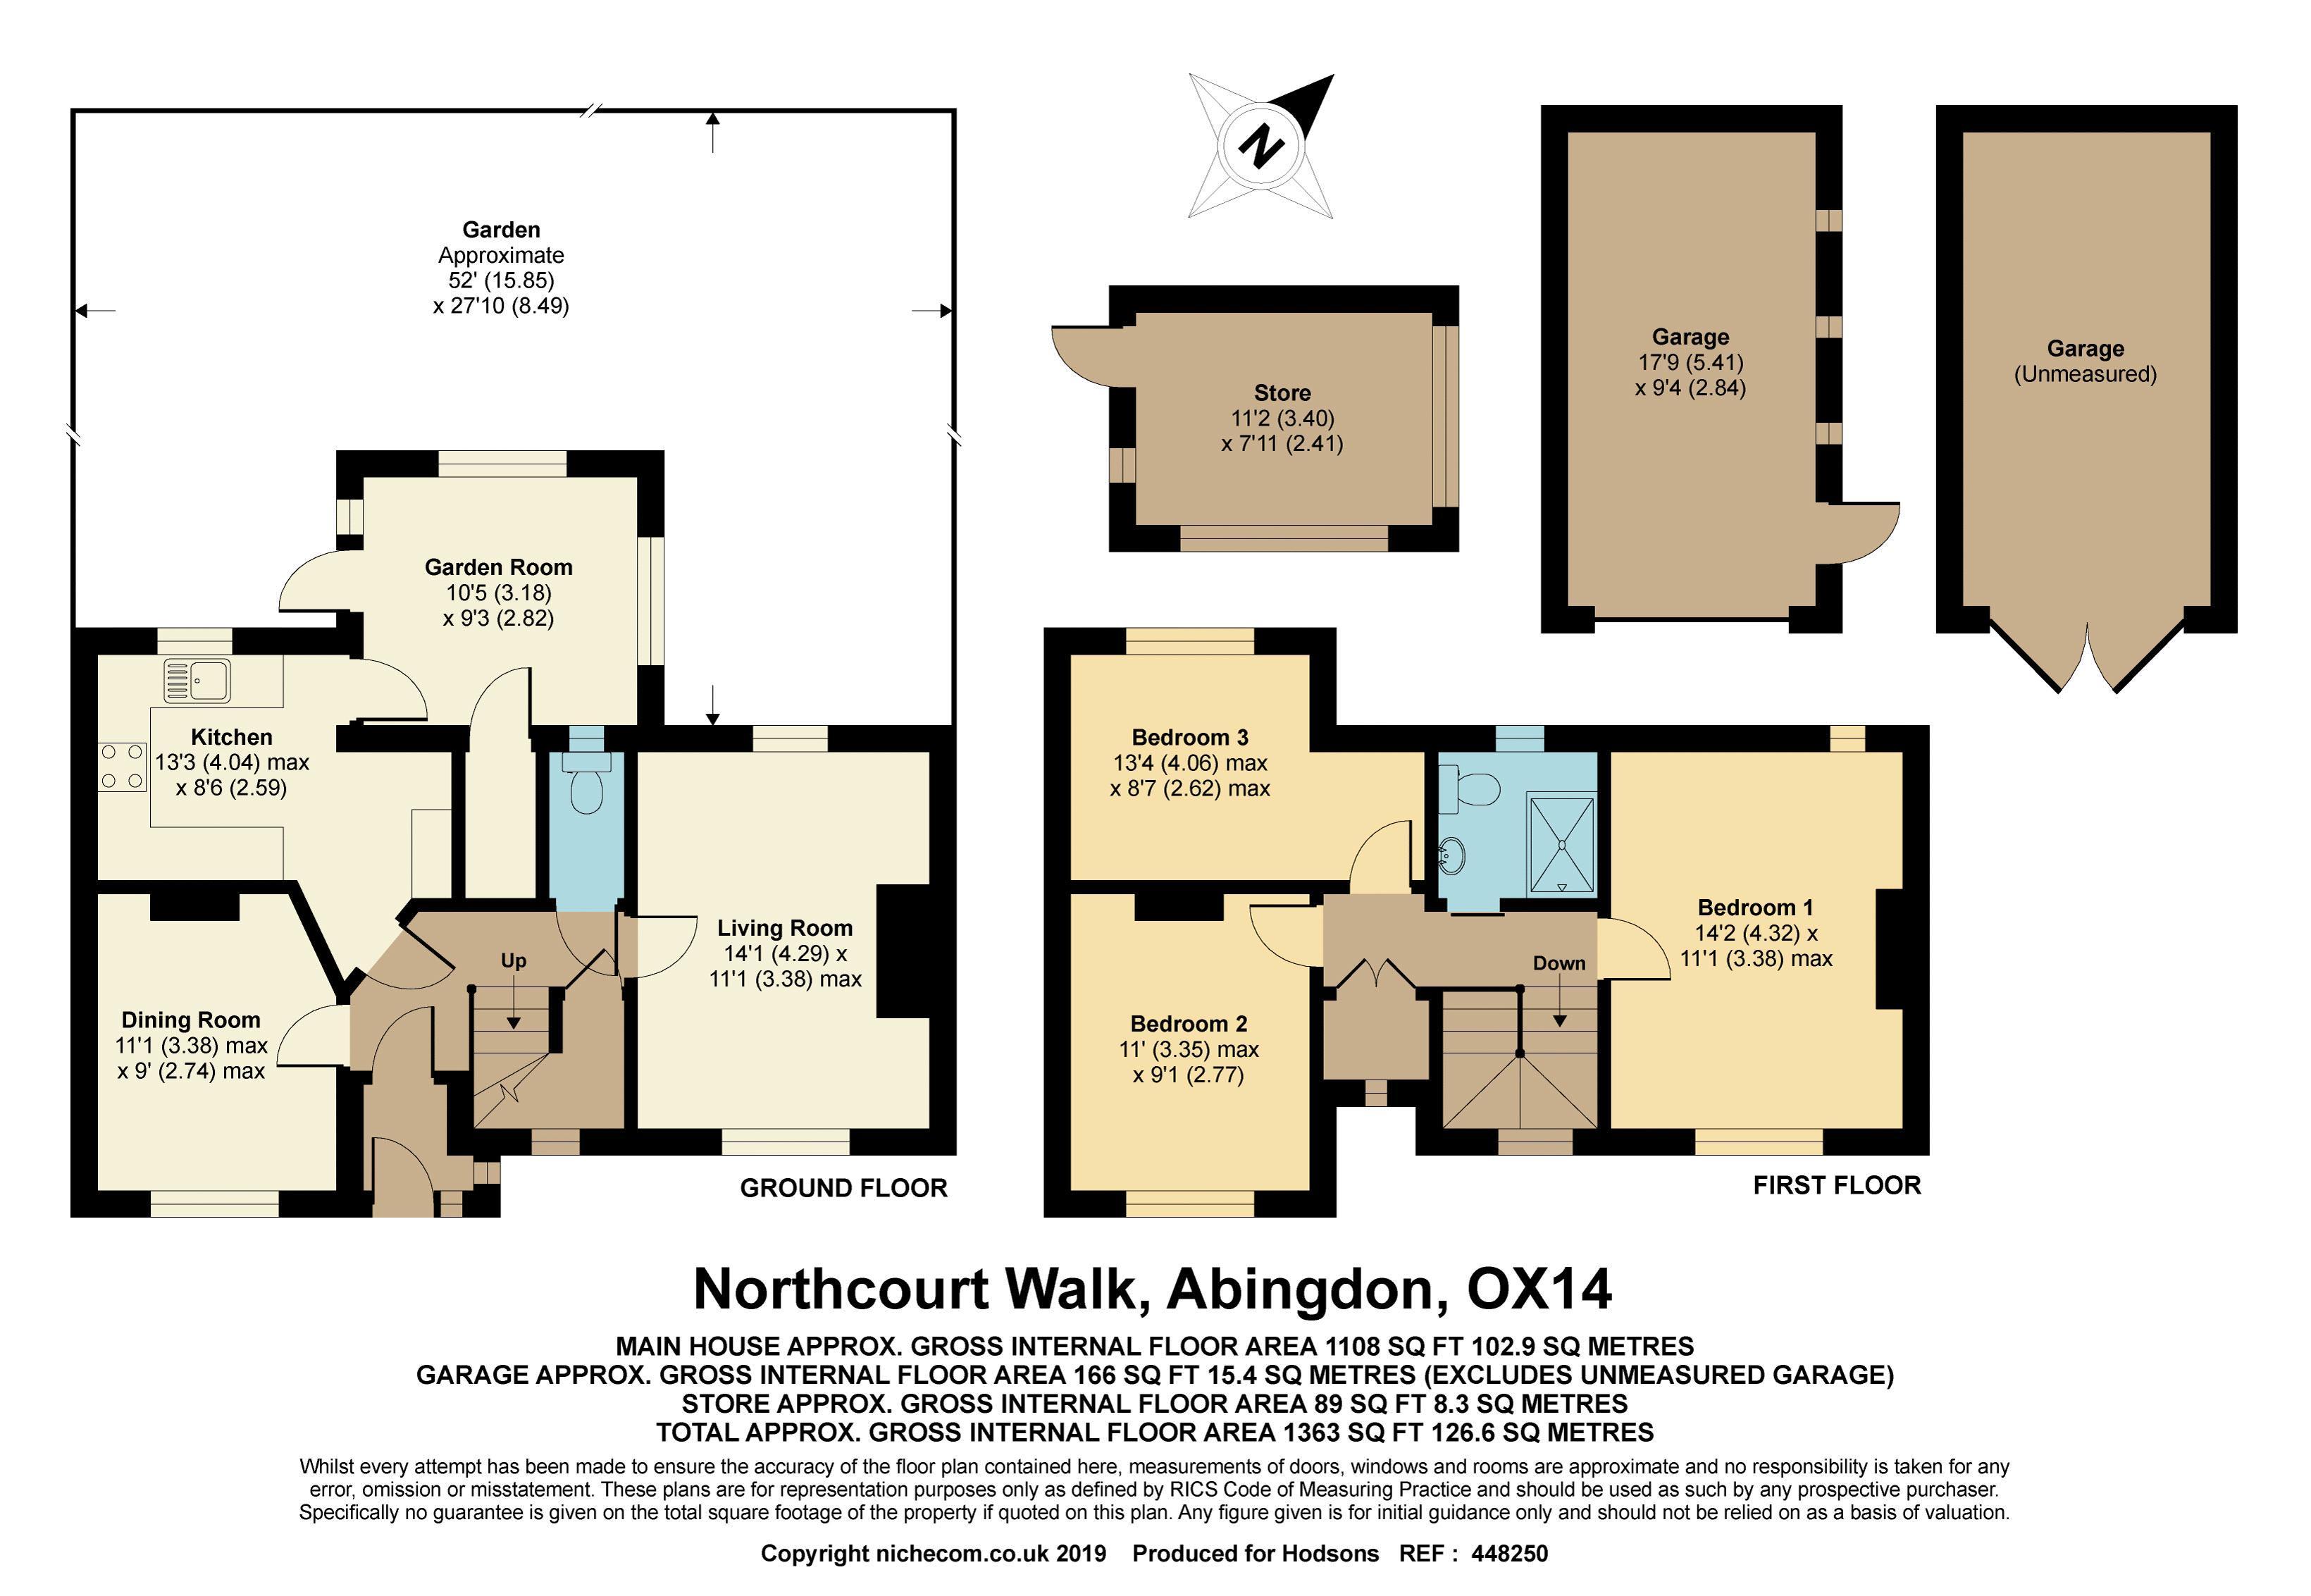 Northcourt Walk